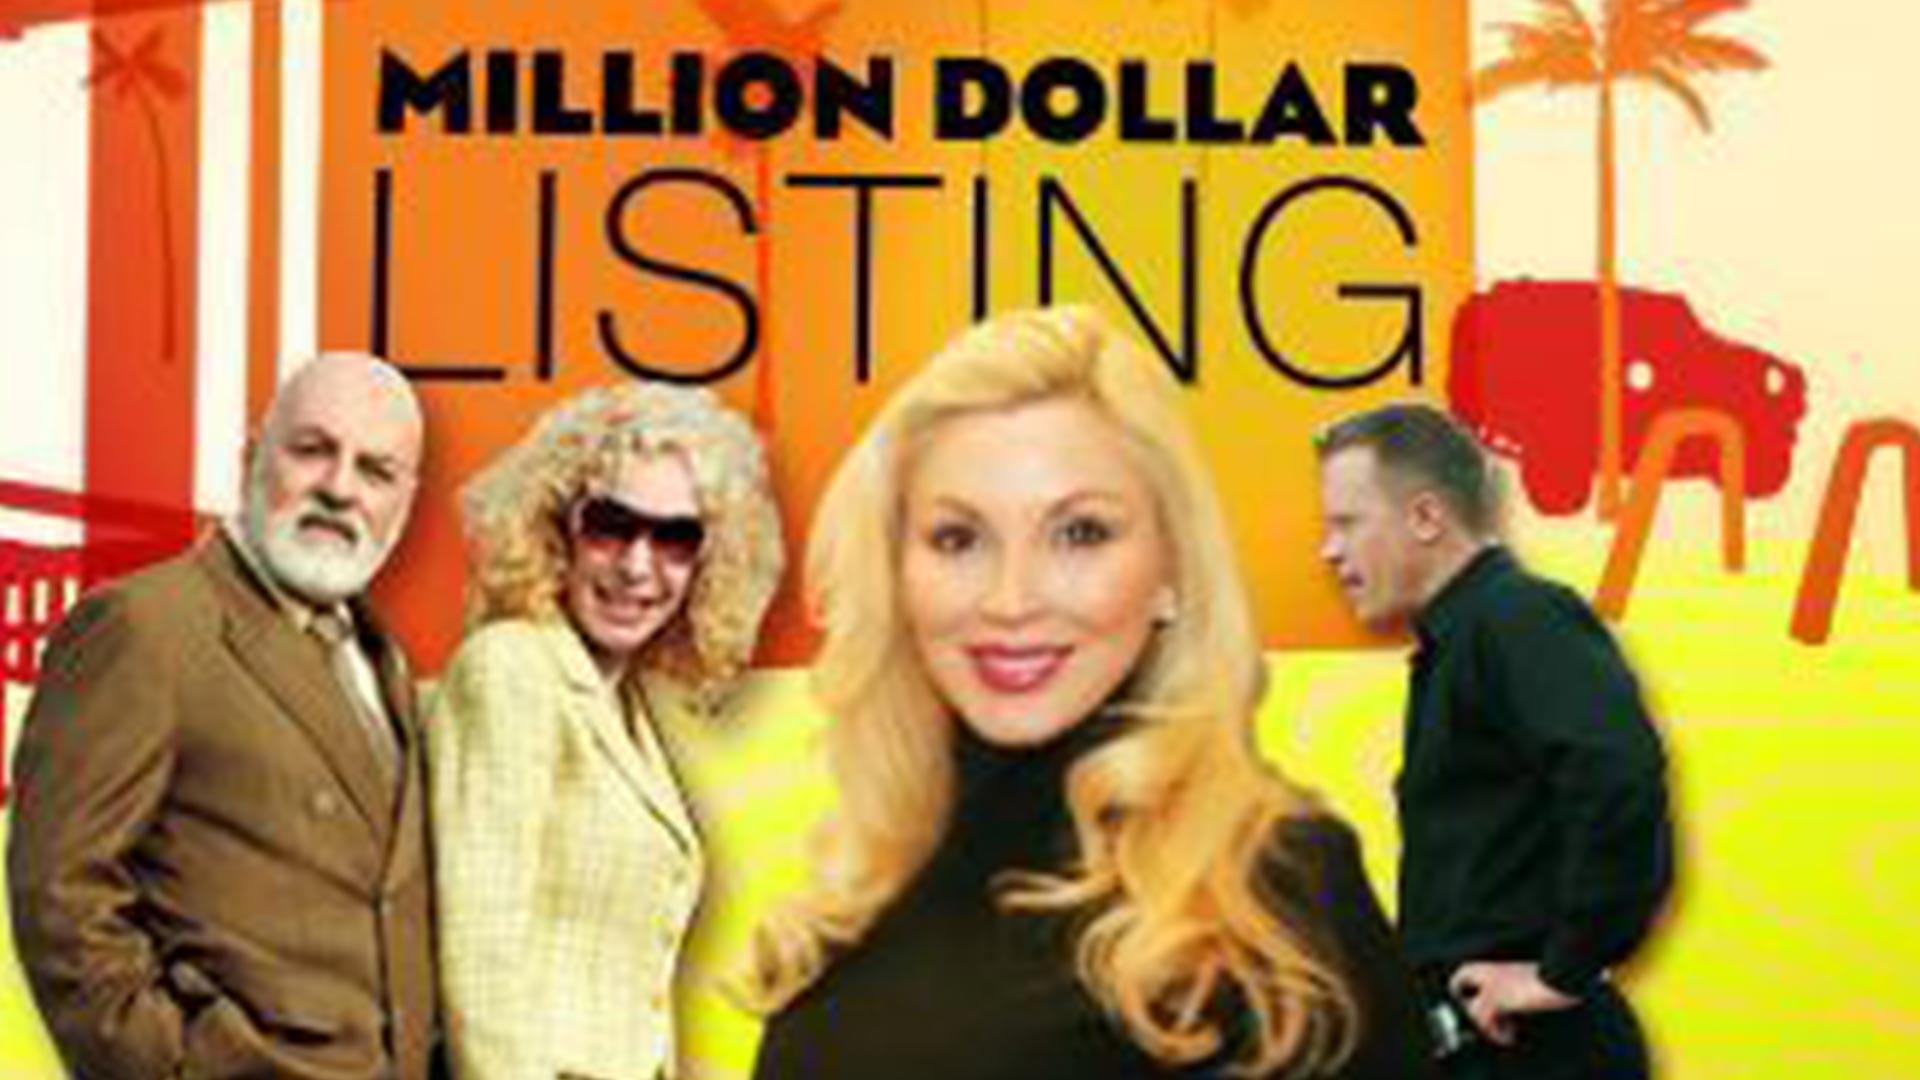 Million Dollar Listing Season 1